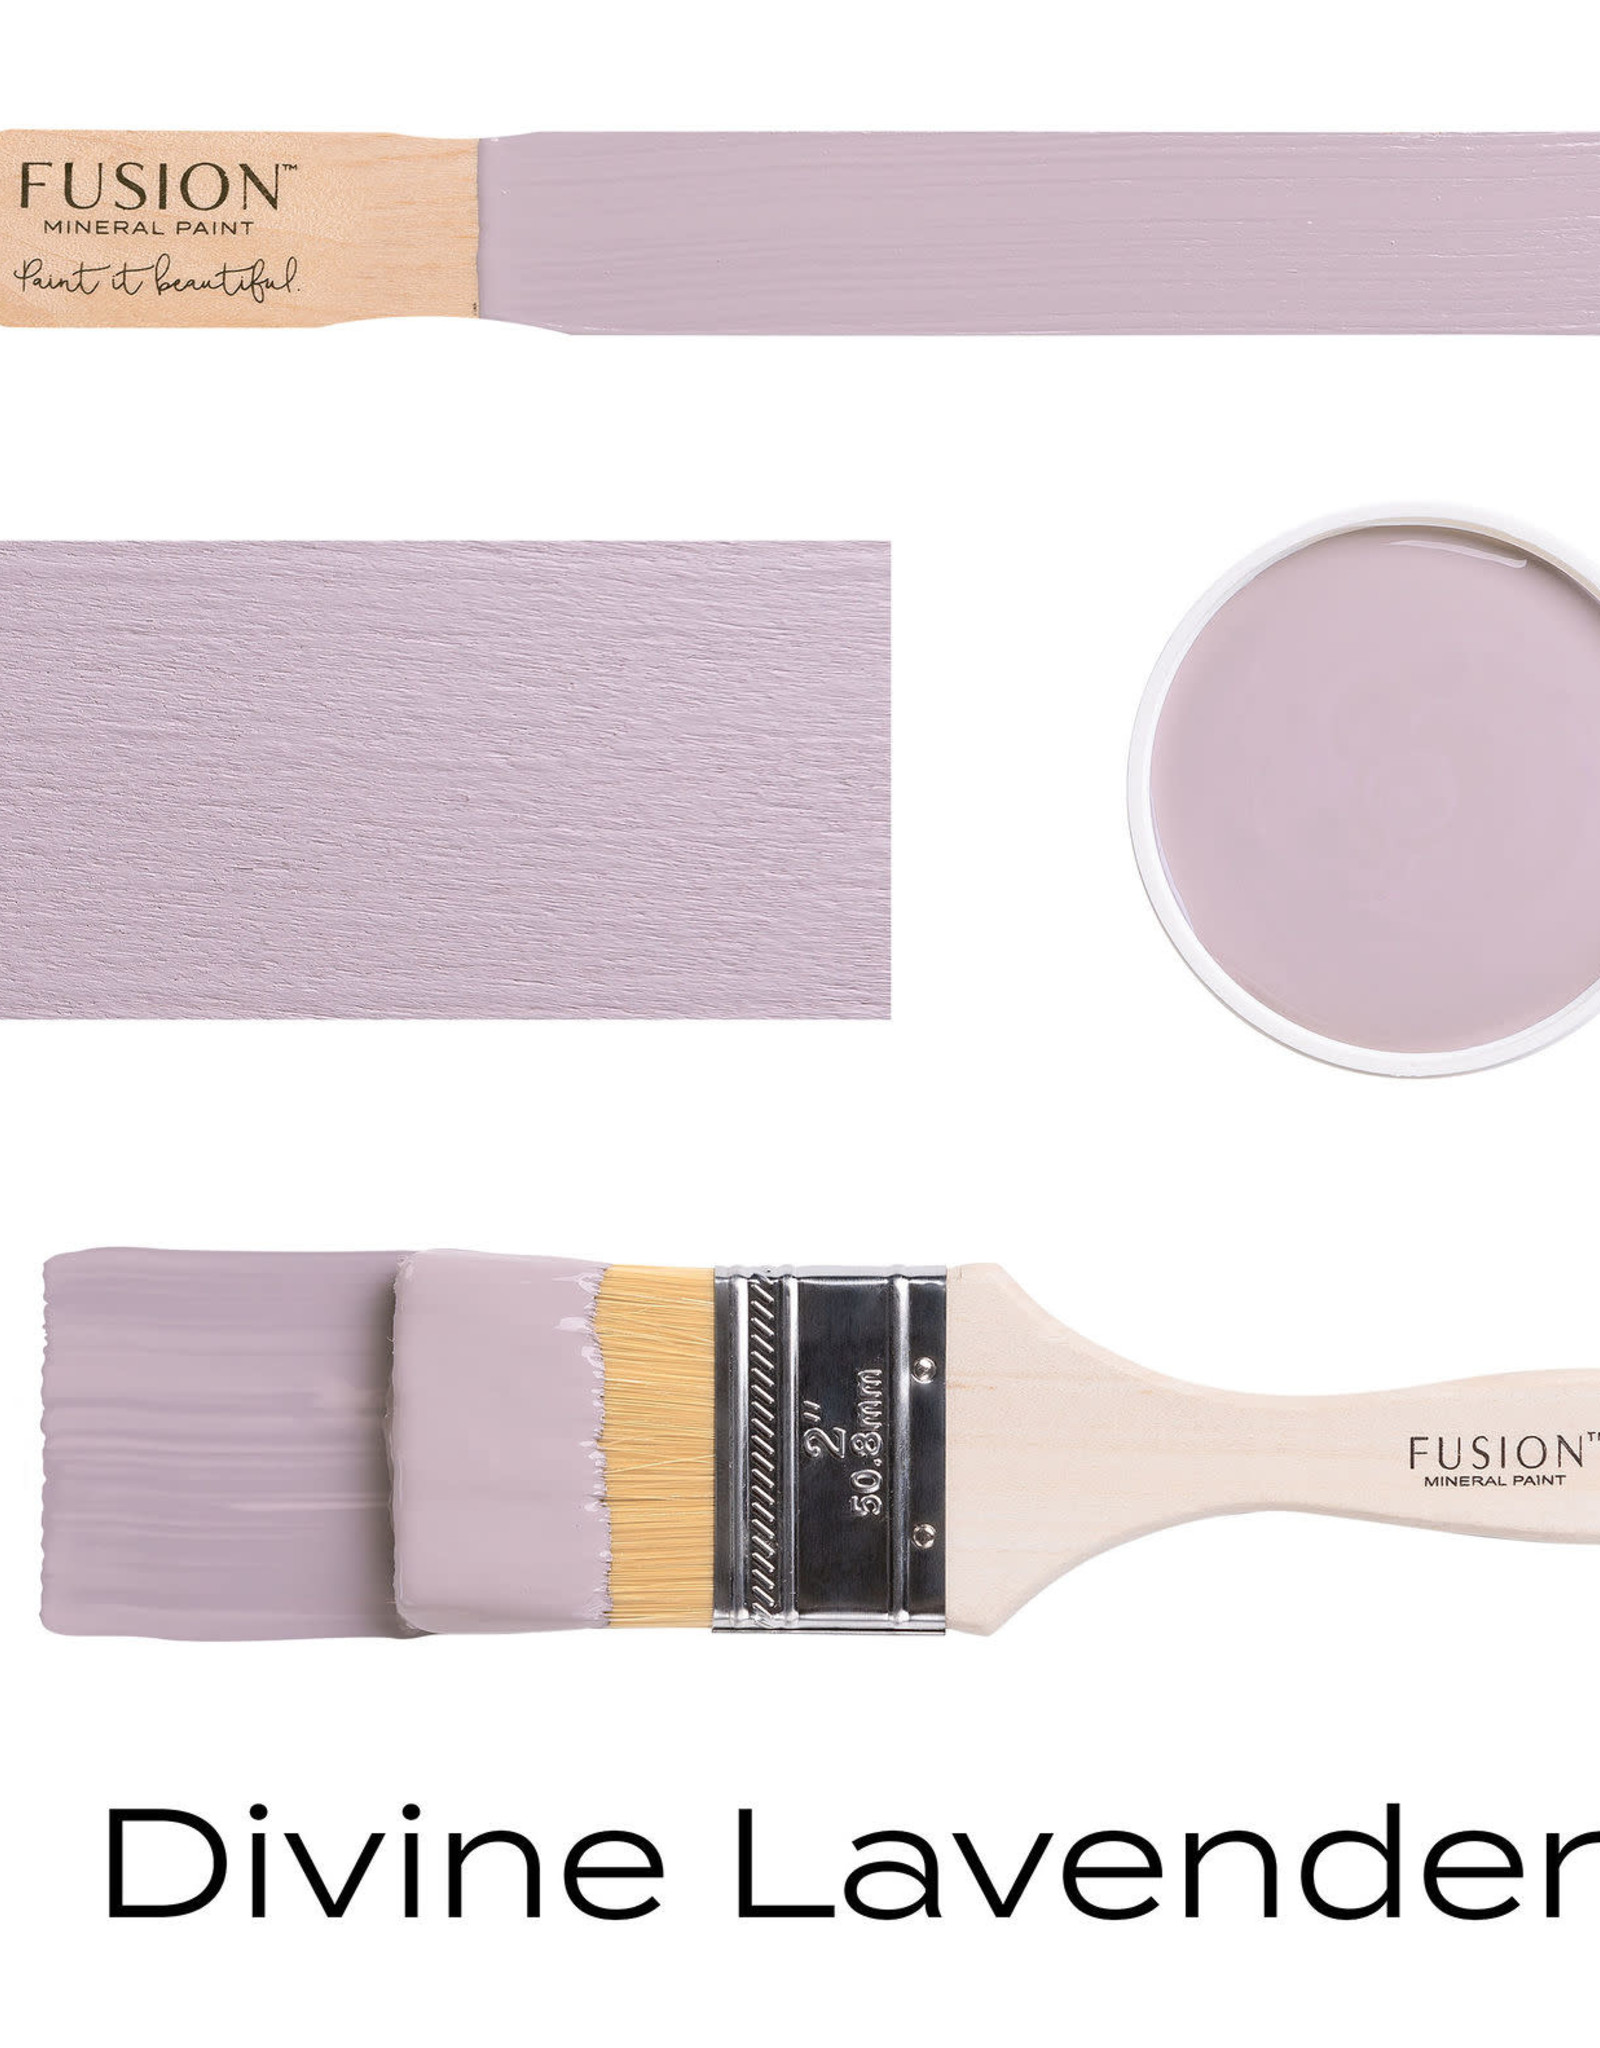 Fusion Mineral Paint Fusion Mineral Paint - Divine Lavender 37ml